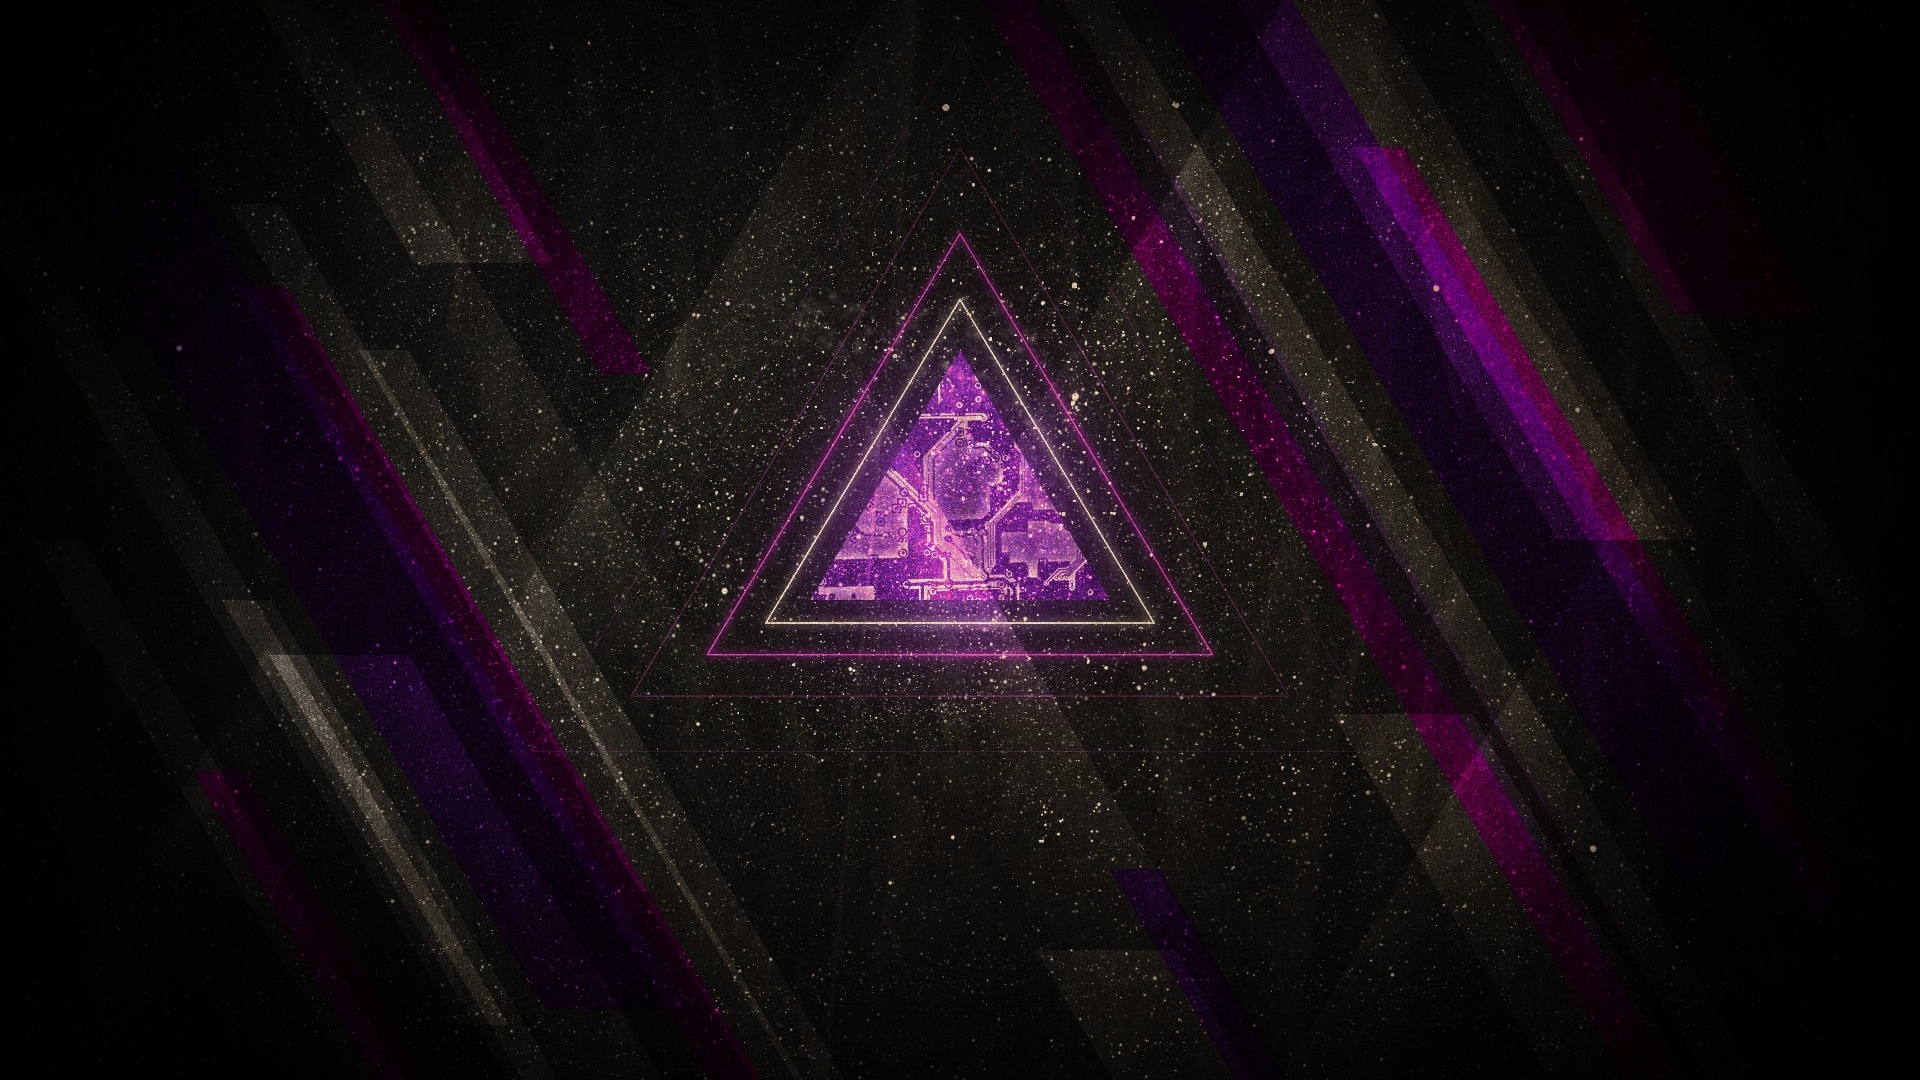 Hd hintergrundbilder dreieck linien lila grau schwarz, desktop ...